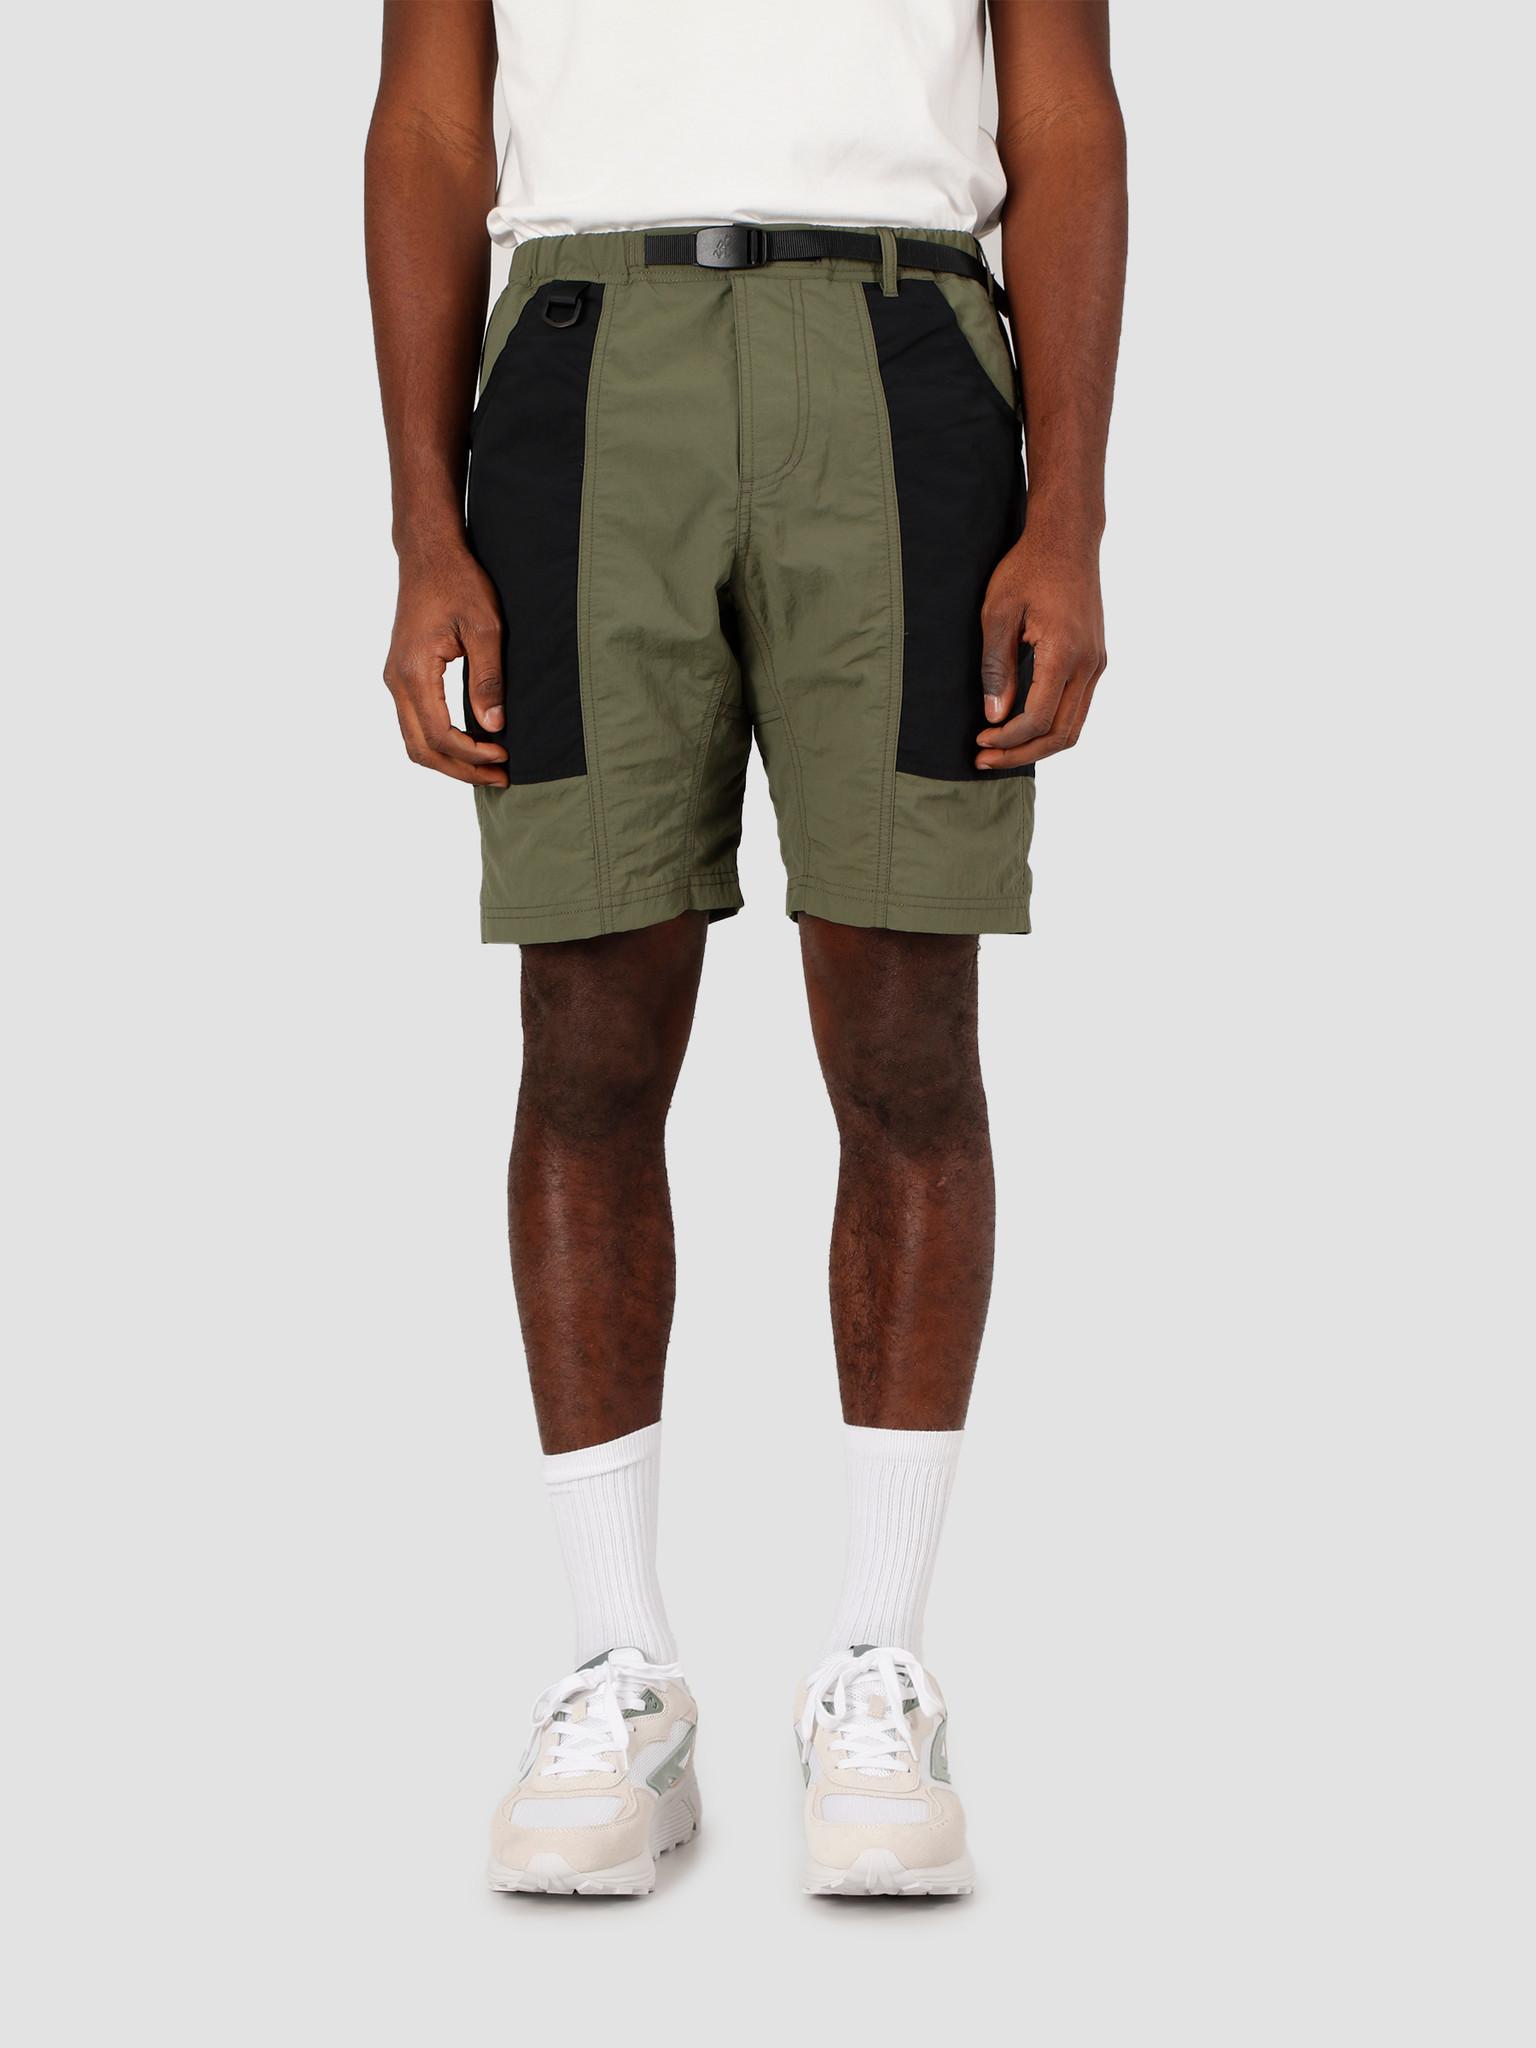 Gramicci Gramicci Shell Gear Shorts Olive Black GUP-20S038